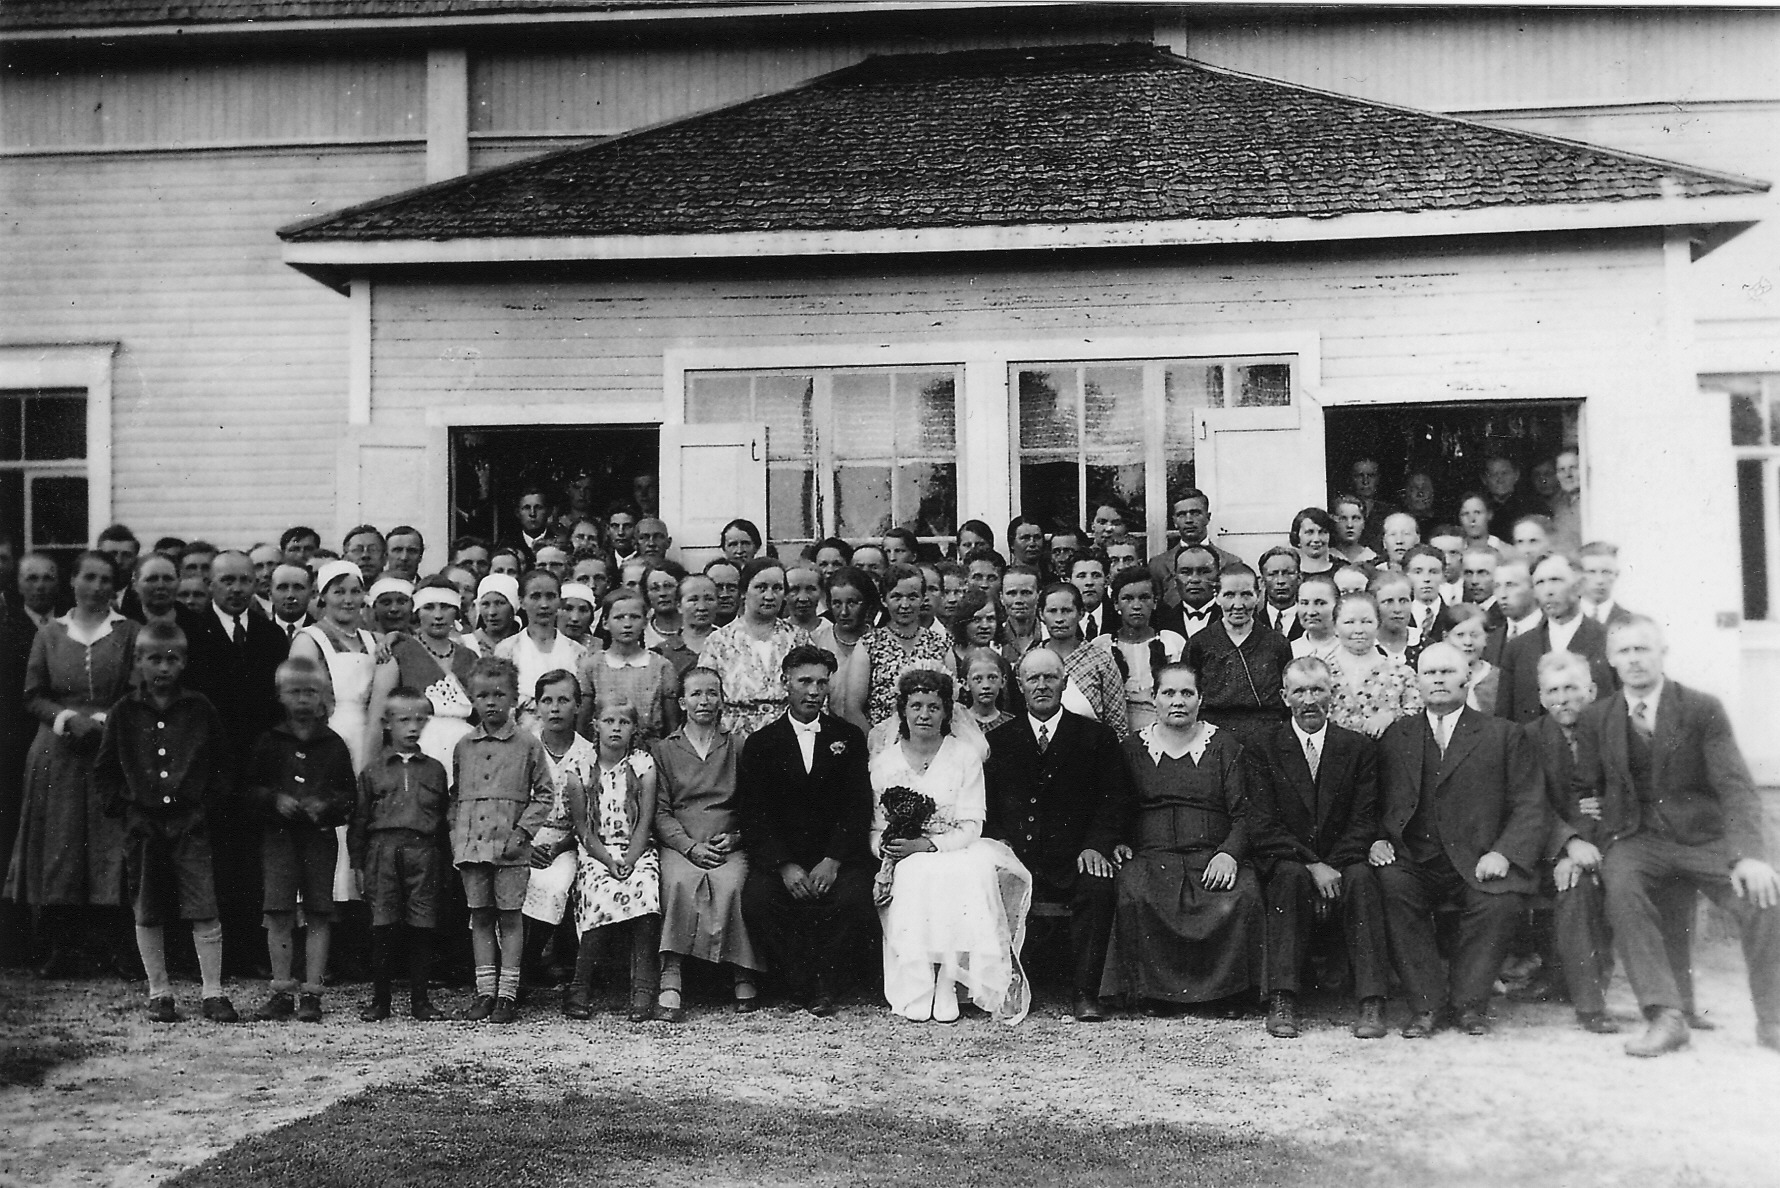 Suomalaiset sukunimet historia